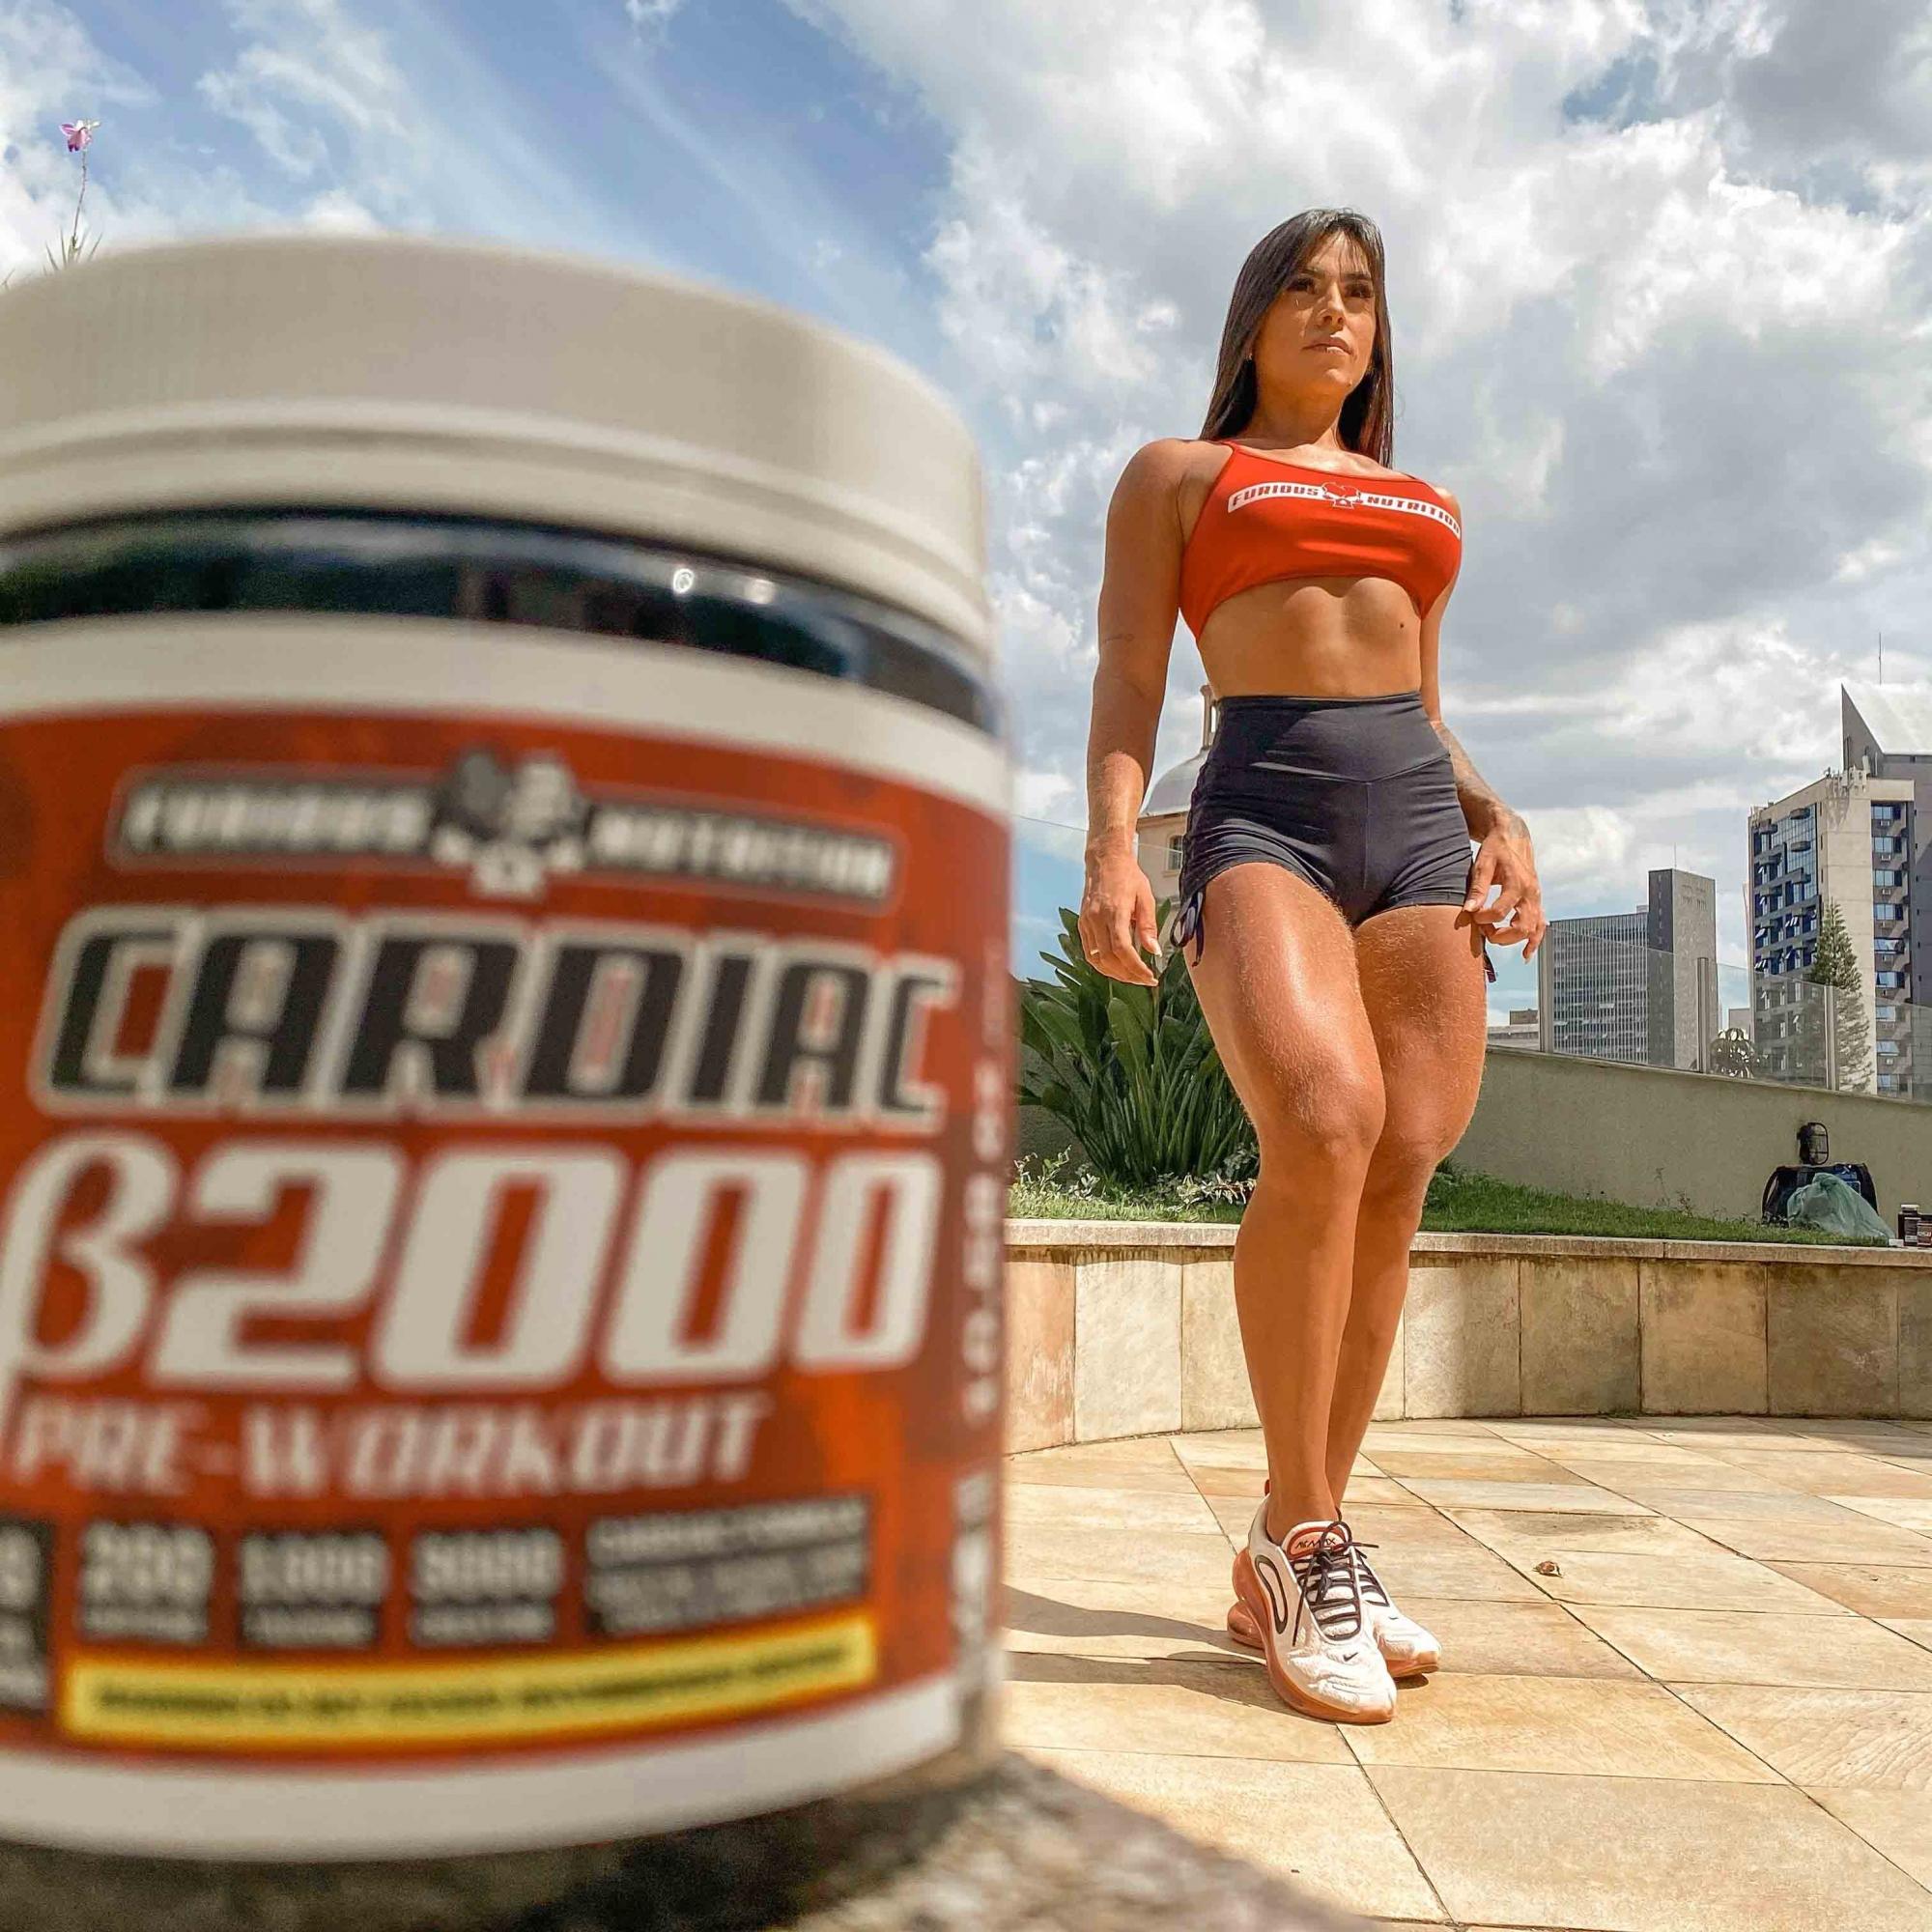 Cardiac Beta 2000 Pote 300 g